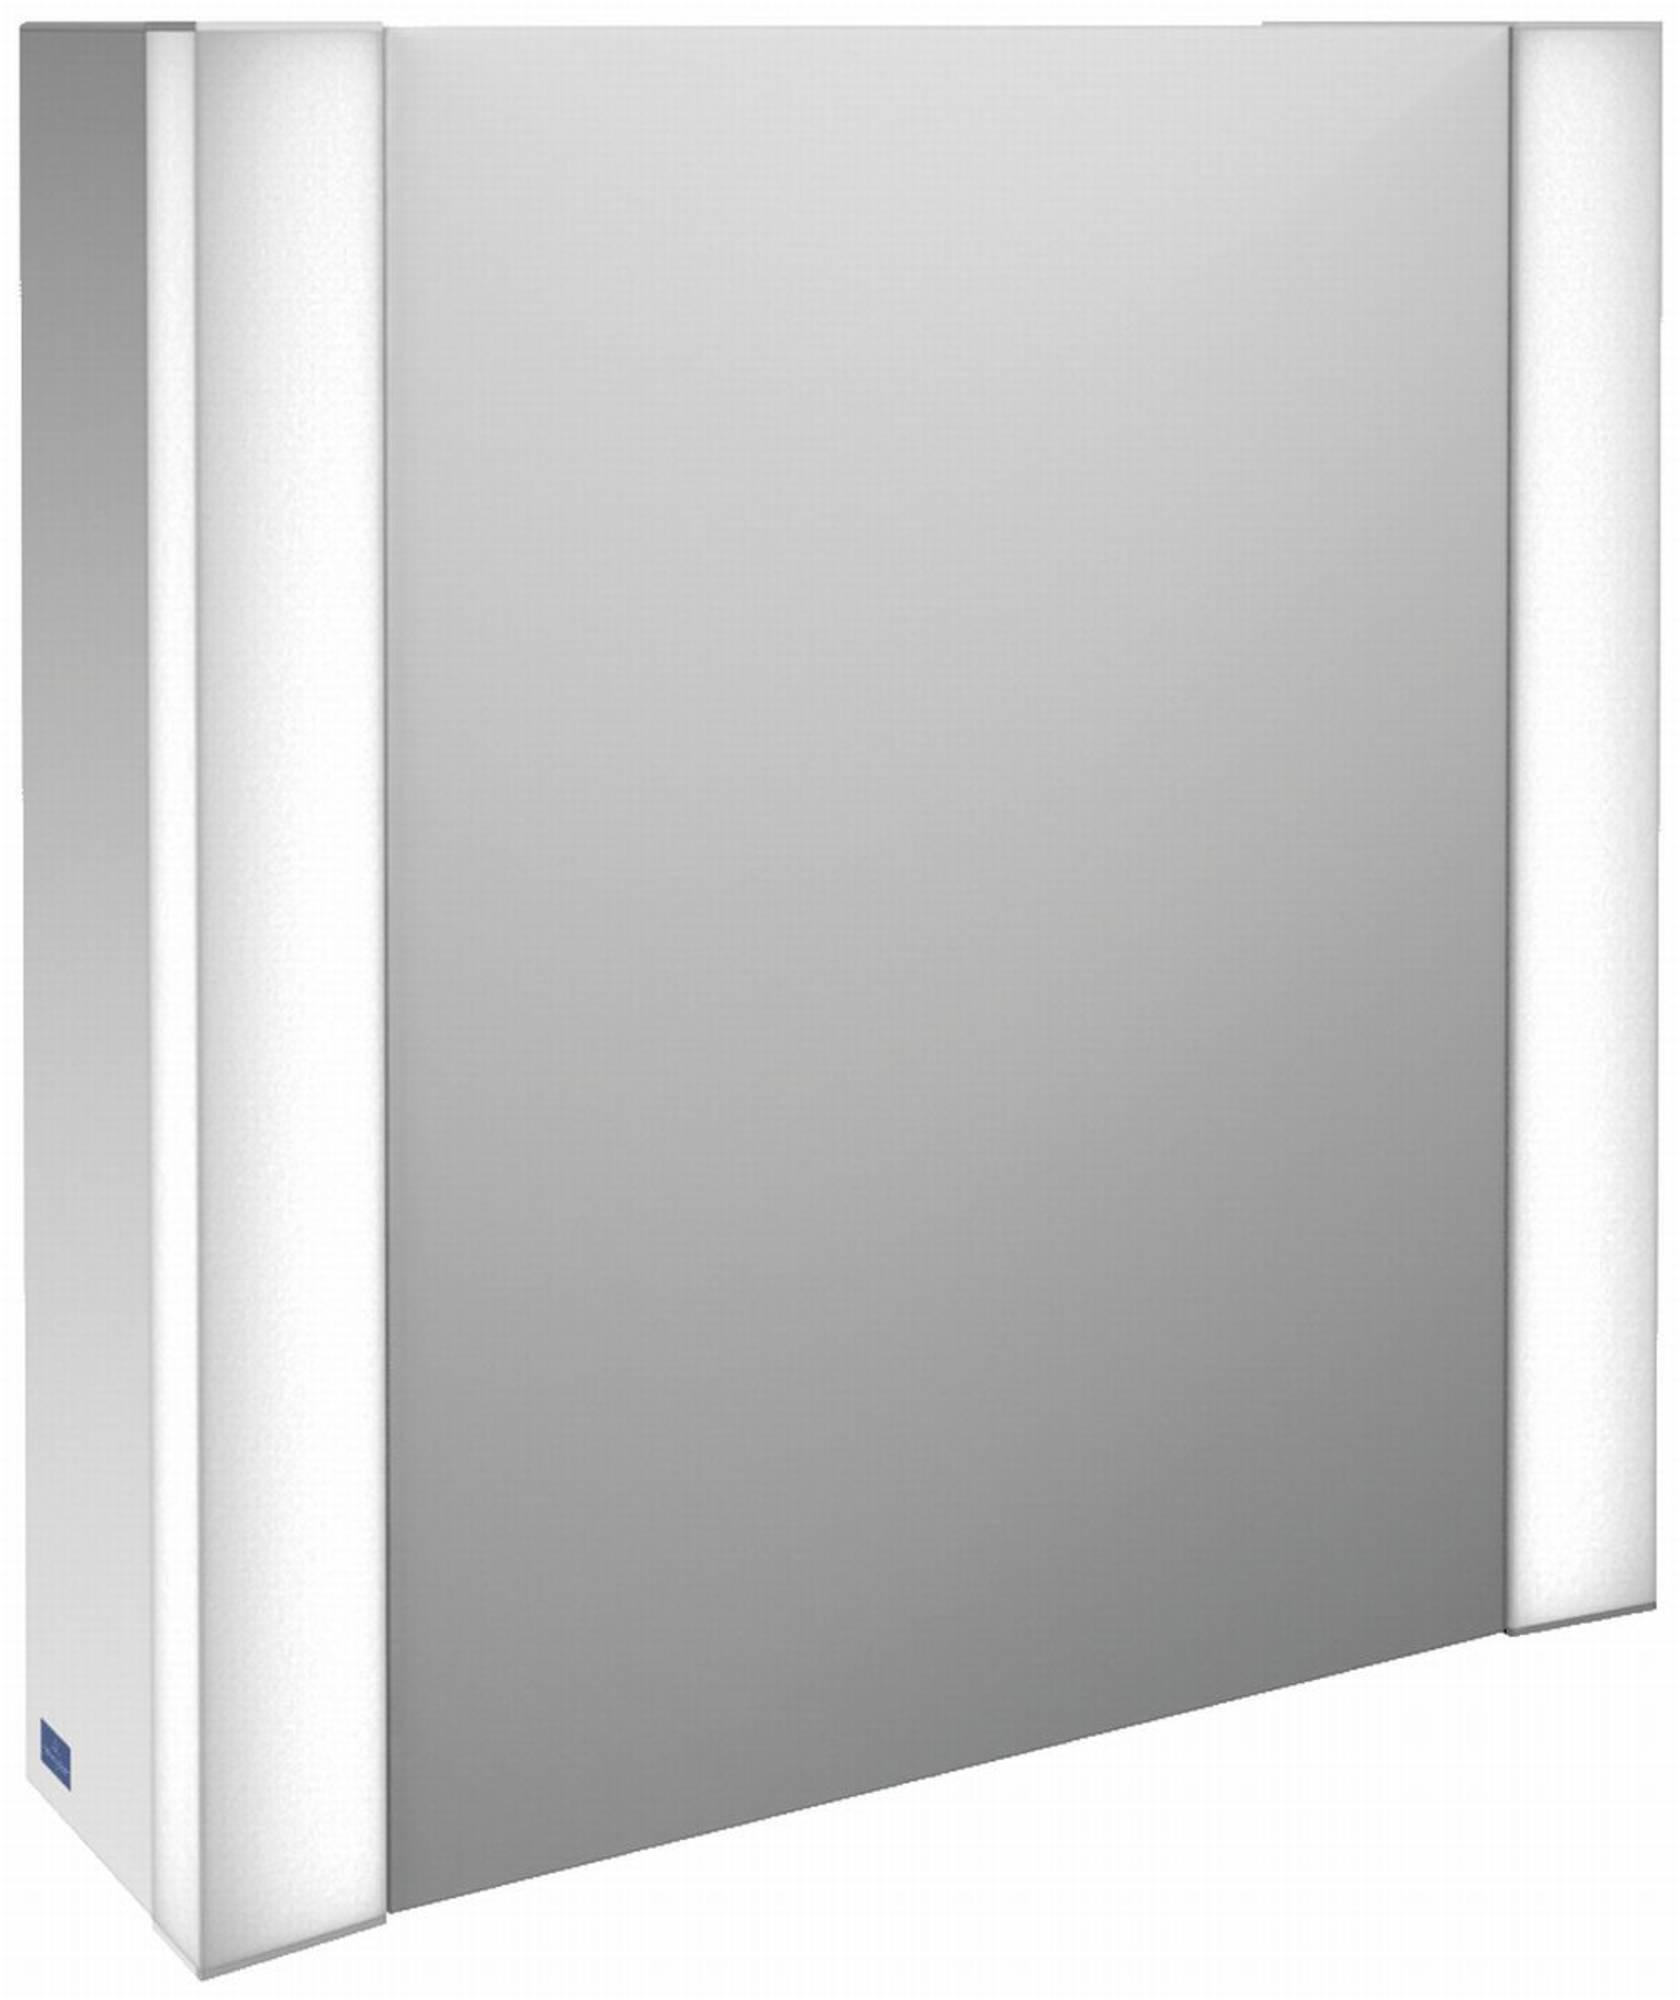 Villeroy&Boch My View spiegelkast 60 deur li m/led m/vergrootspiegel Glossy Wit